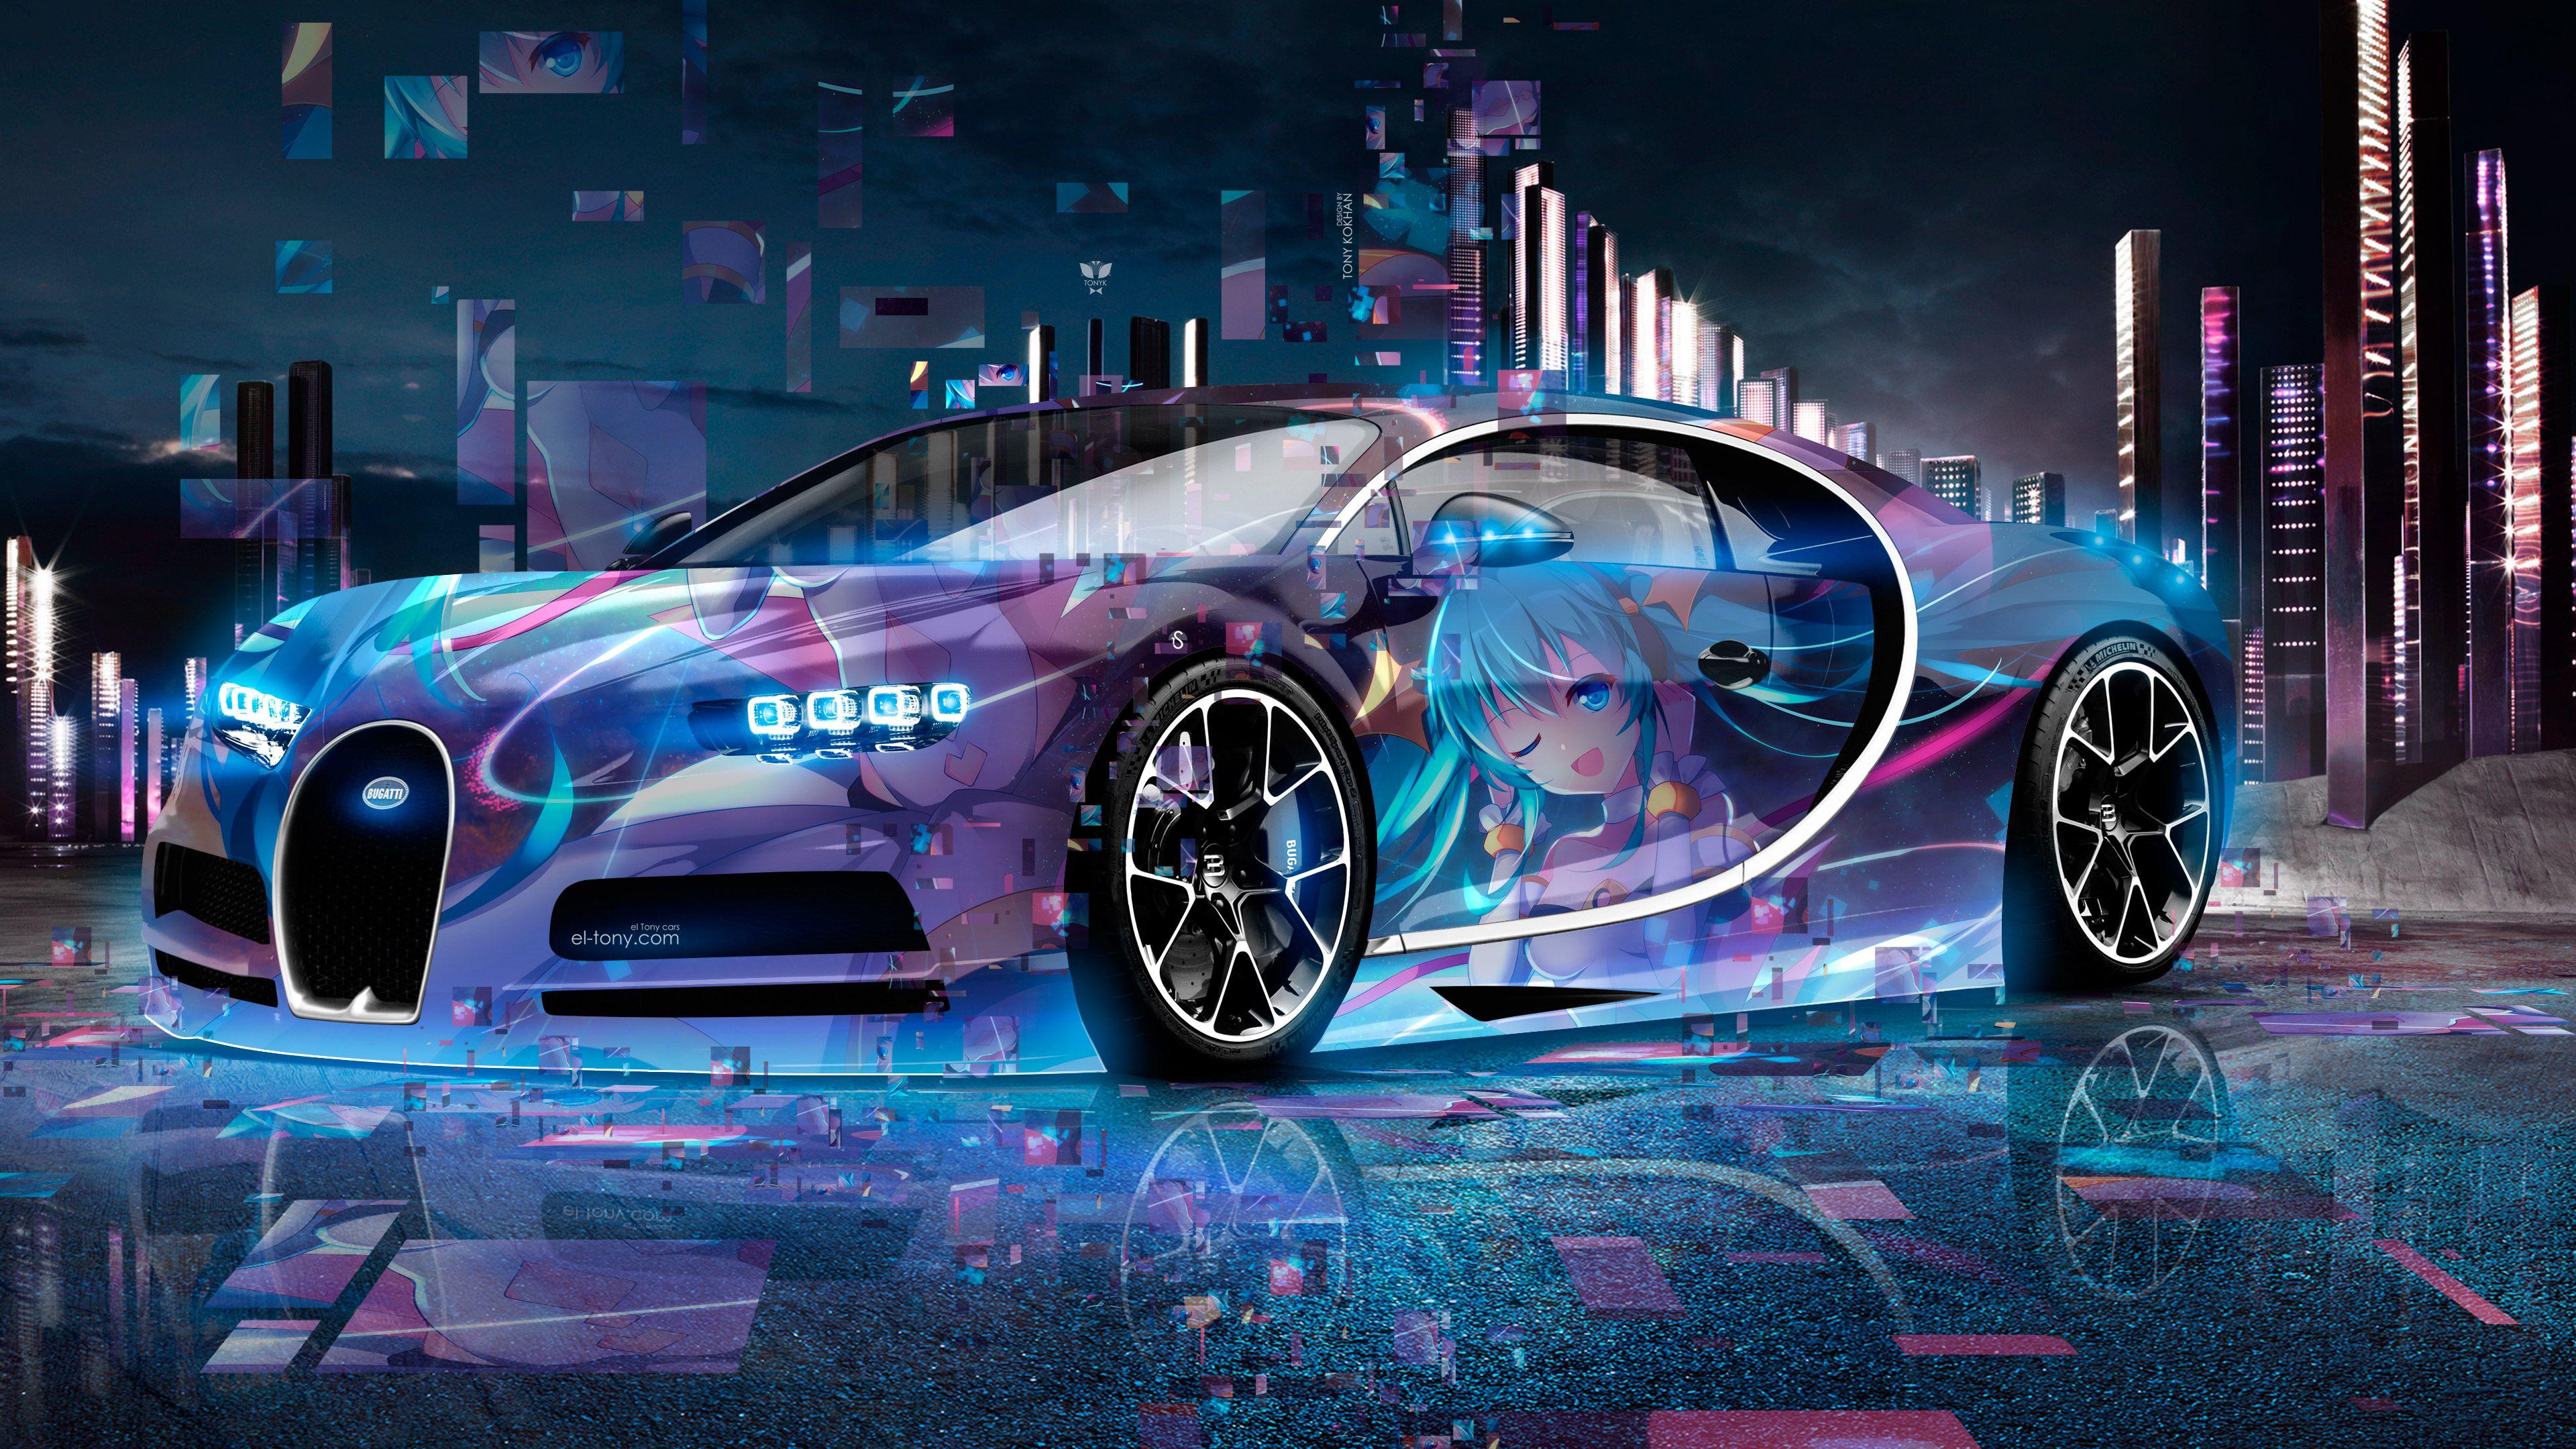 Neon Wallpaper Bugatti In 2020 With Images Neon Wallpaper